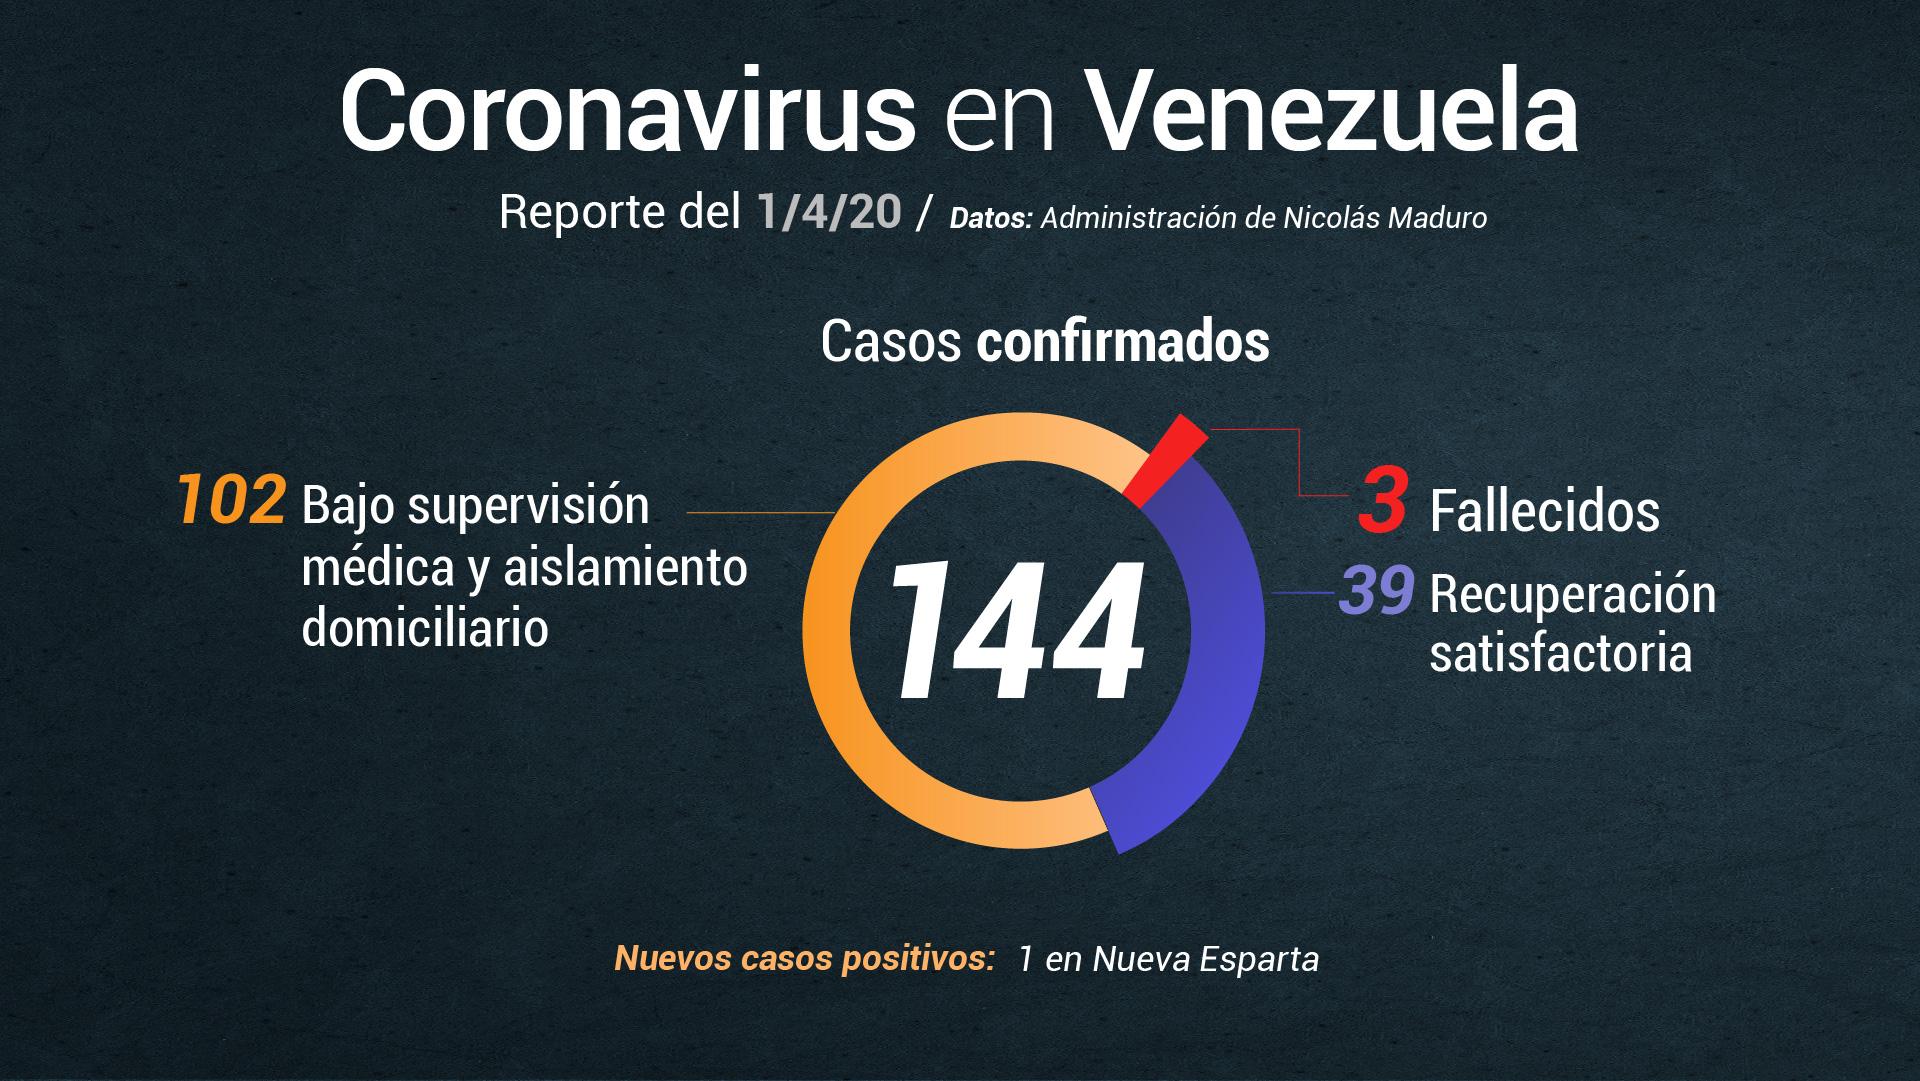 Jorge Rodríguez informa de 1 nuevo caso de coronavirus este #1Abr